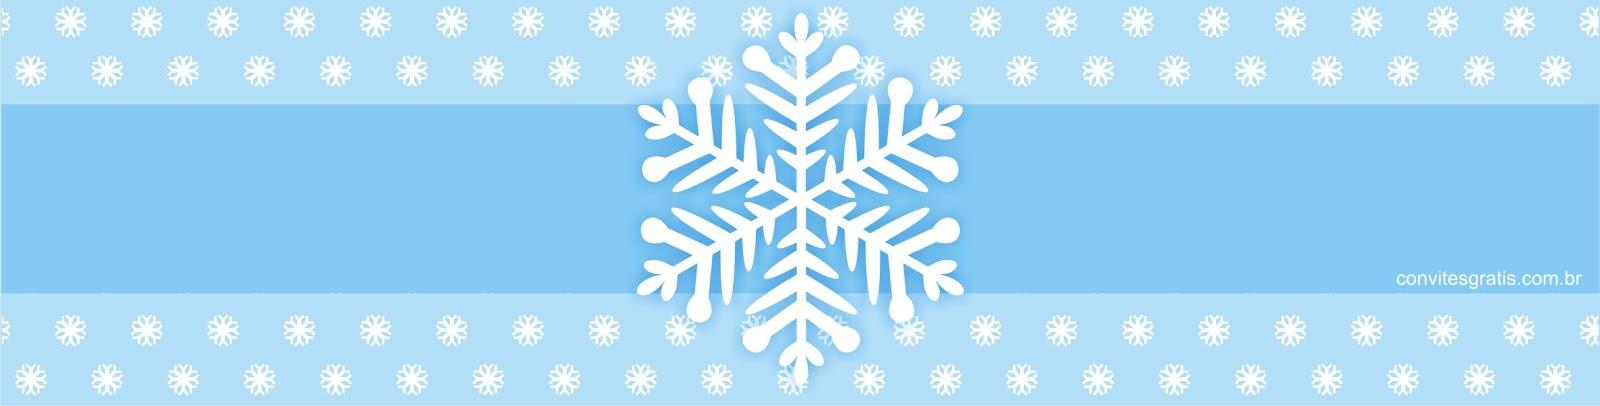 adesivo agua gratis para imprimir Frozen